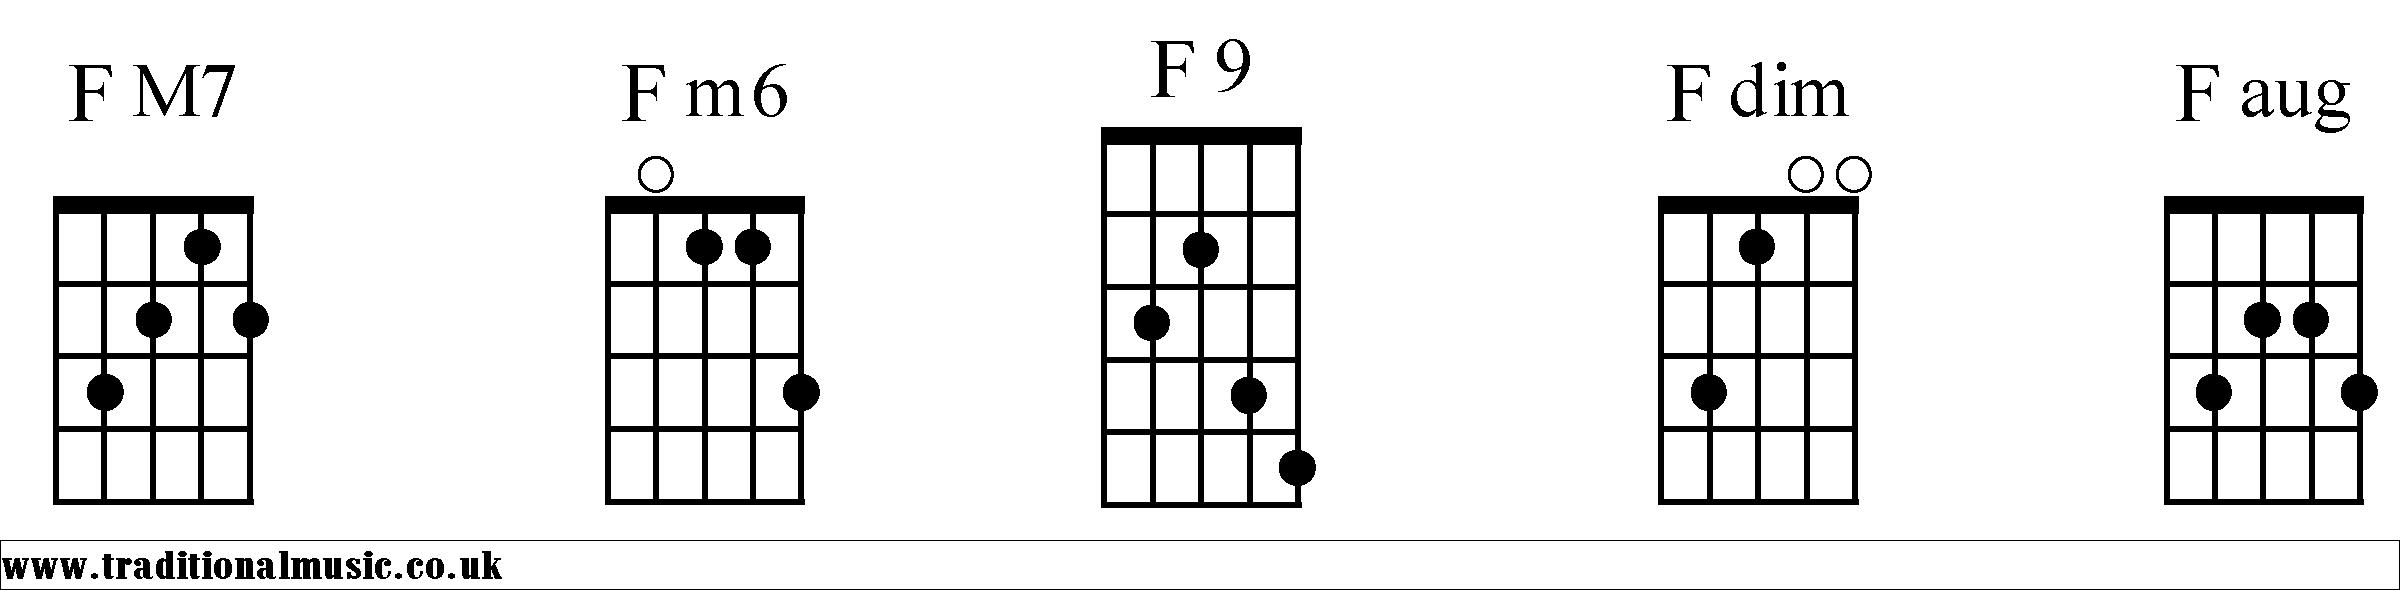 Fmaj7 Guitar Chord Images Basic Guitar Chords Finger Placement